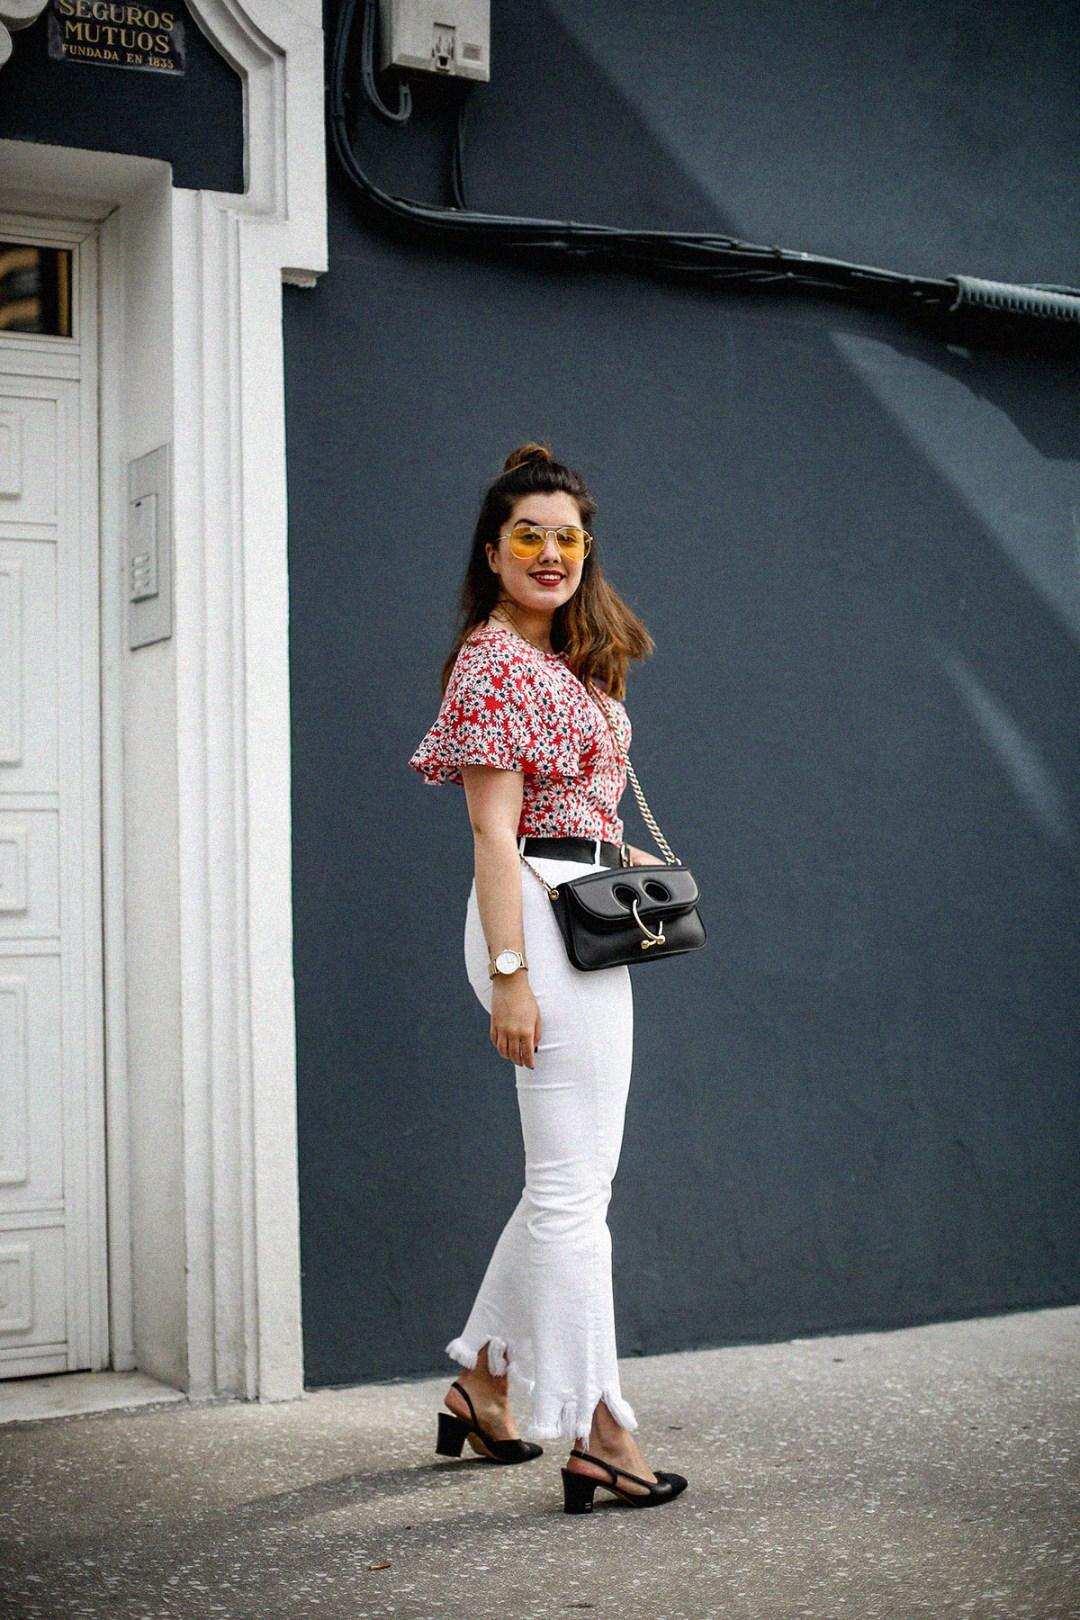 flower-top-zara-frayed-white-jeans-chanel-slingback-jw-anderson-bag-streetstyle12